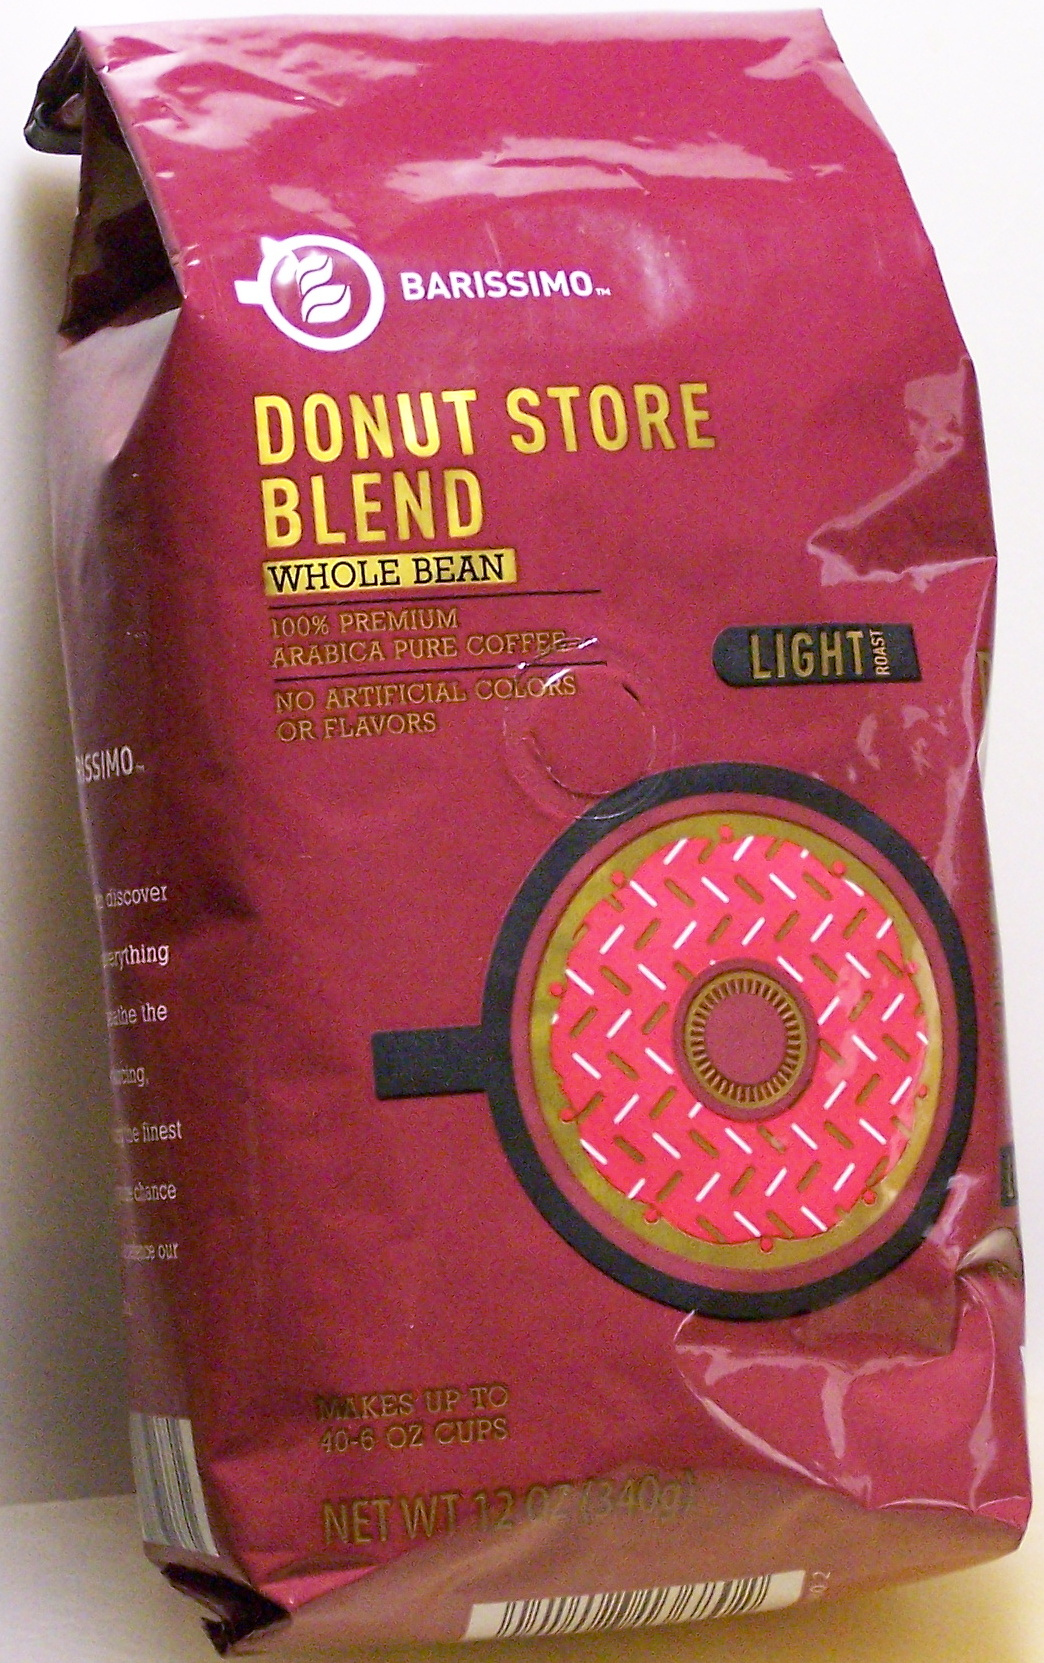 aldi donut store whole bean coffee - Donut Shop Coffee